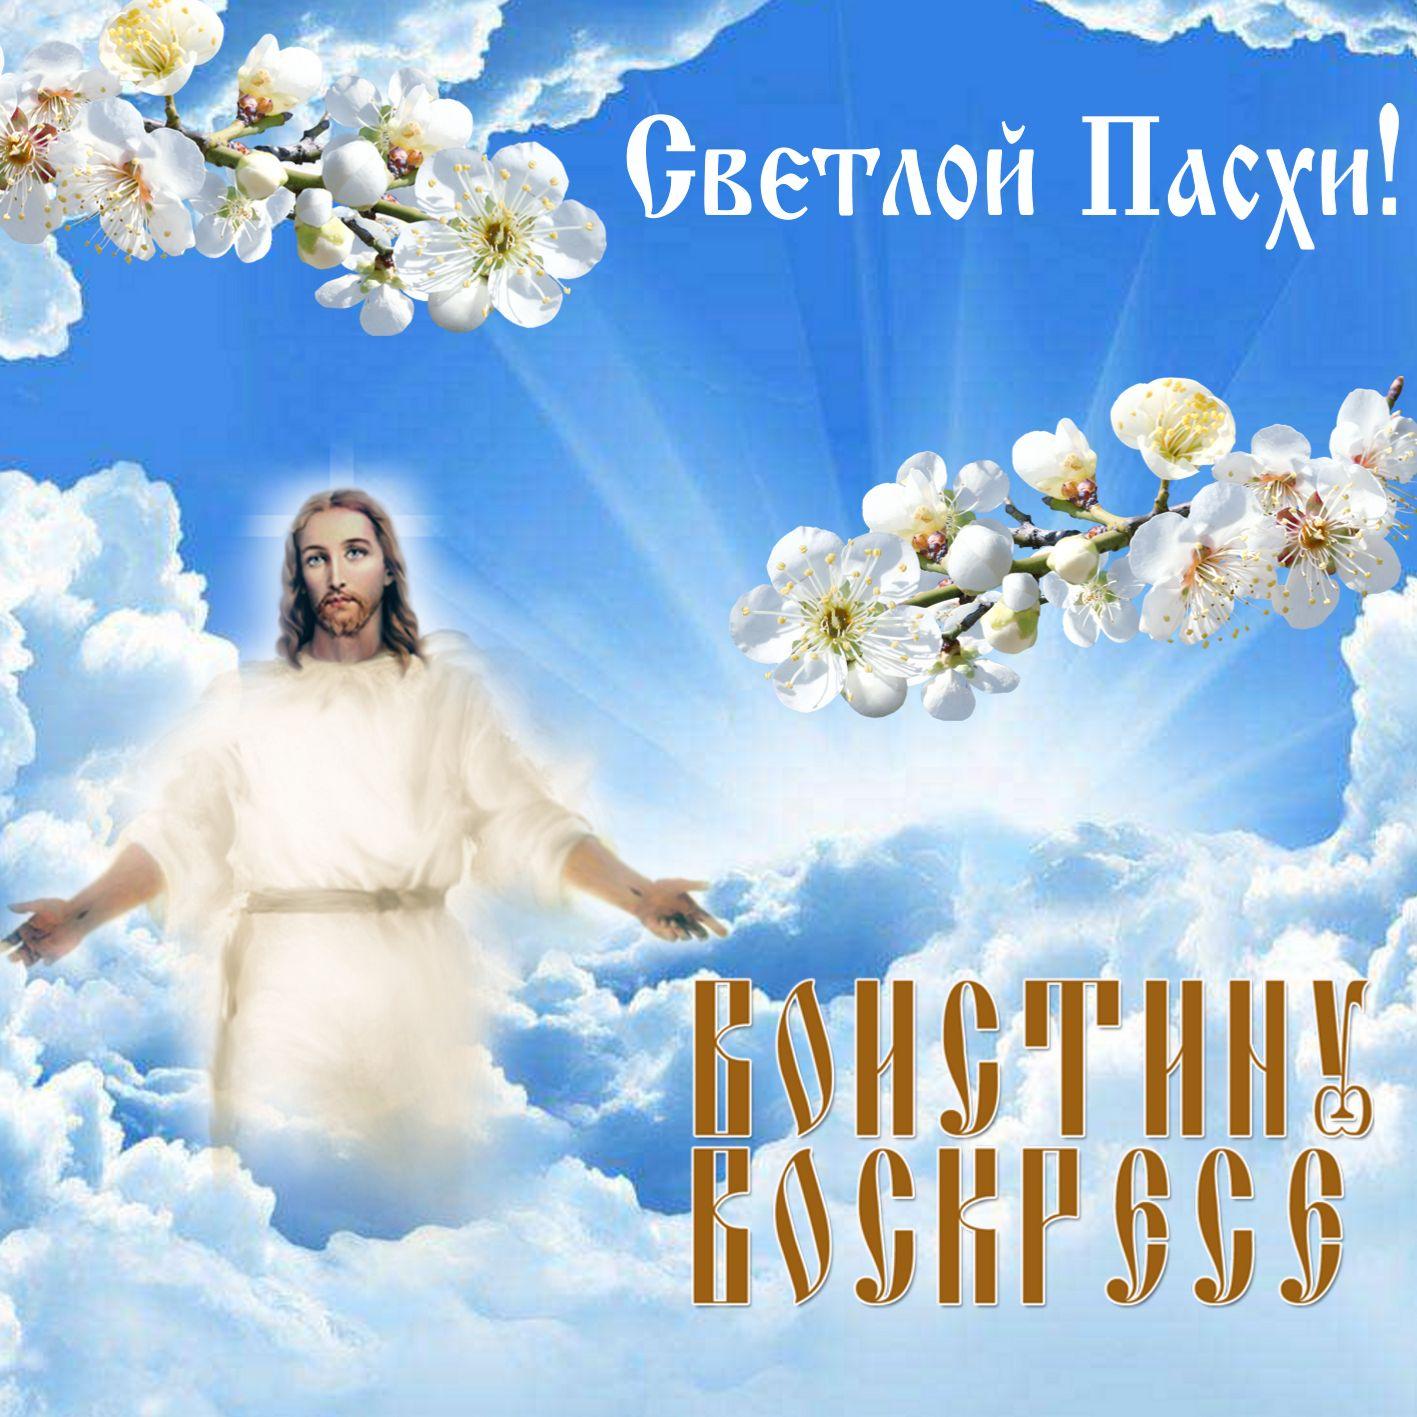 Открытка с Пасхой - лик Христа на фоне синего неба